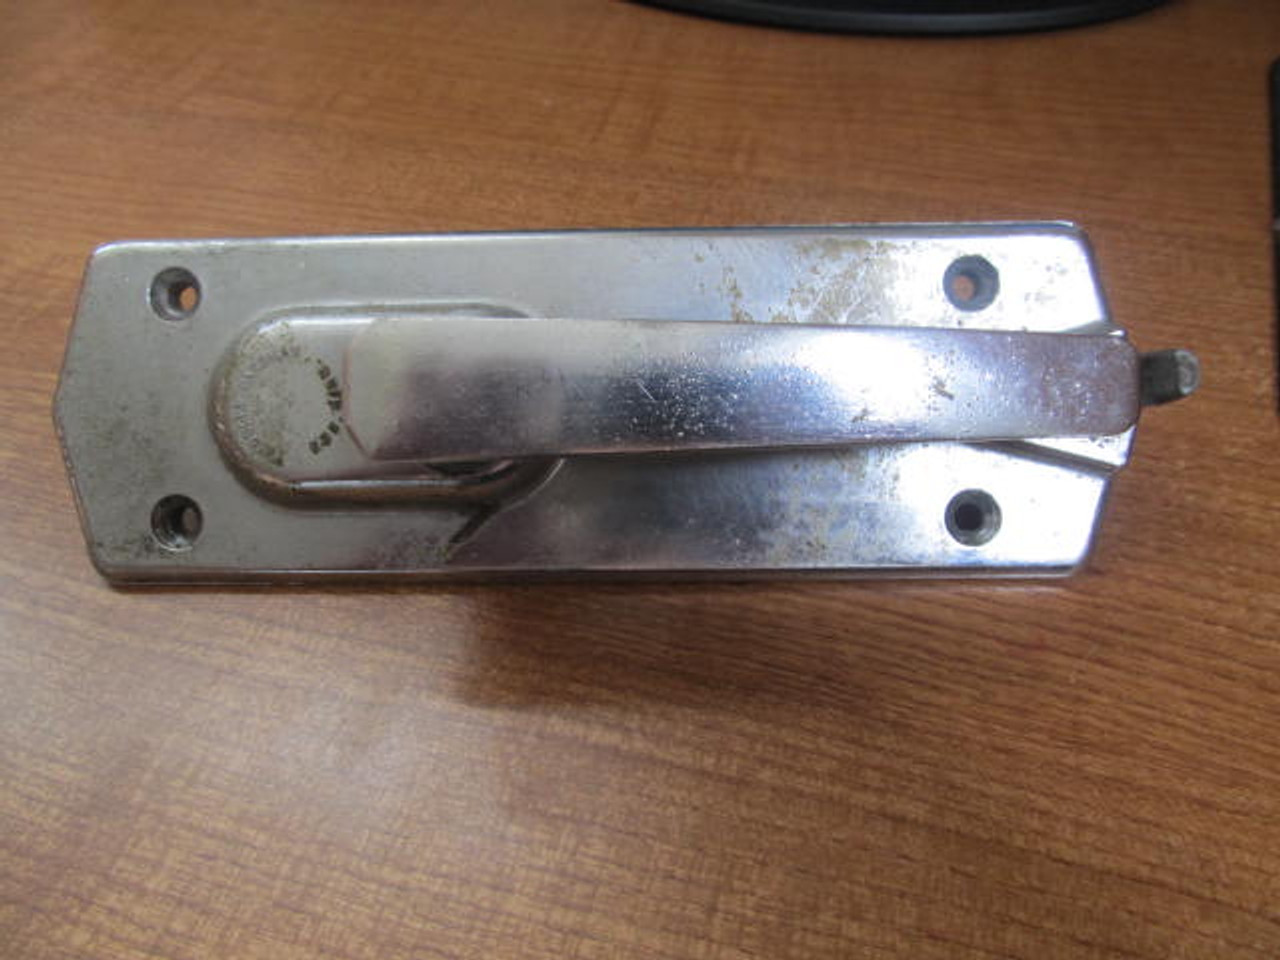 Bargman Inside L-66 Plate & Handle (HW365)